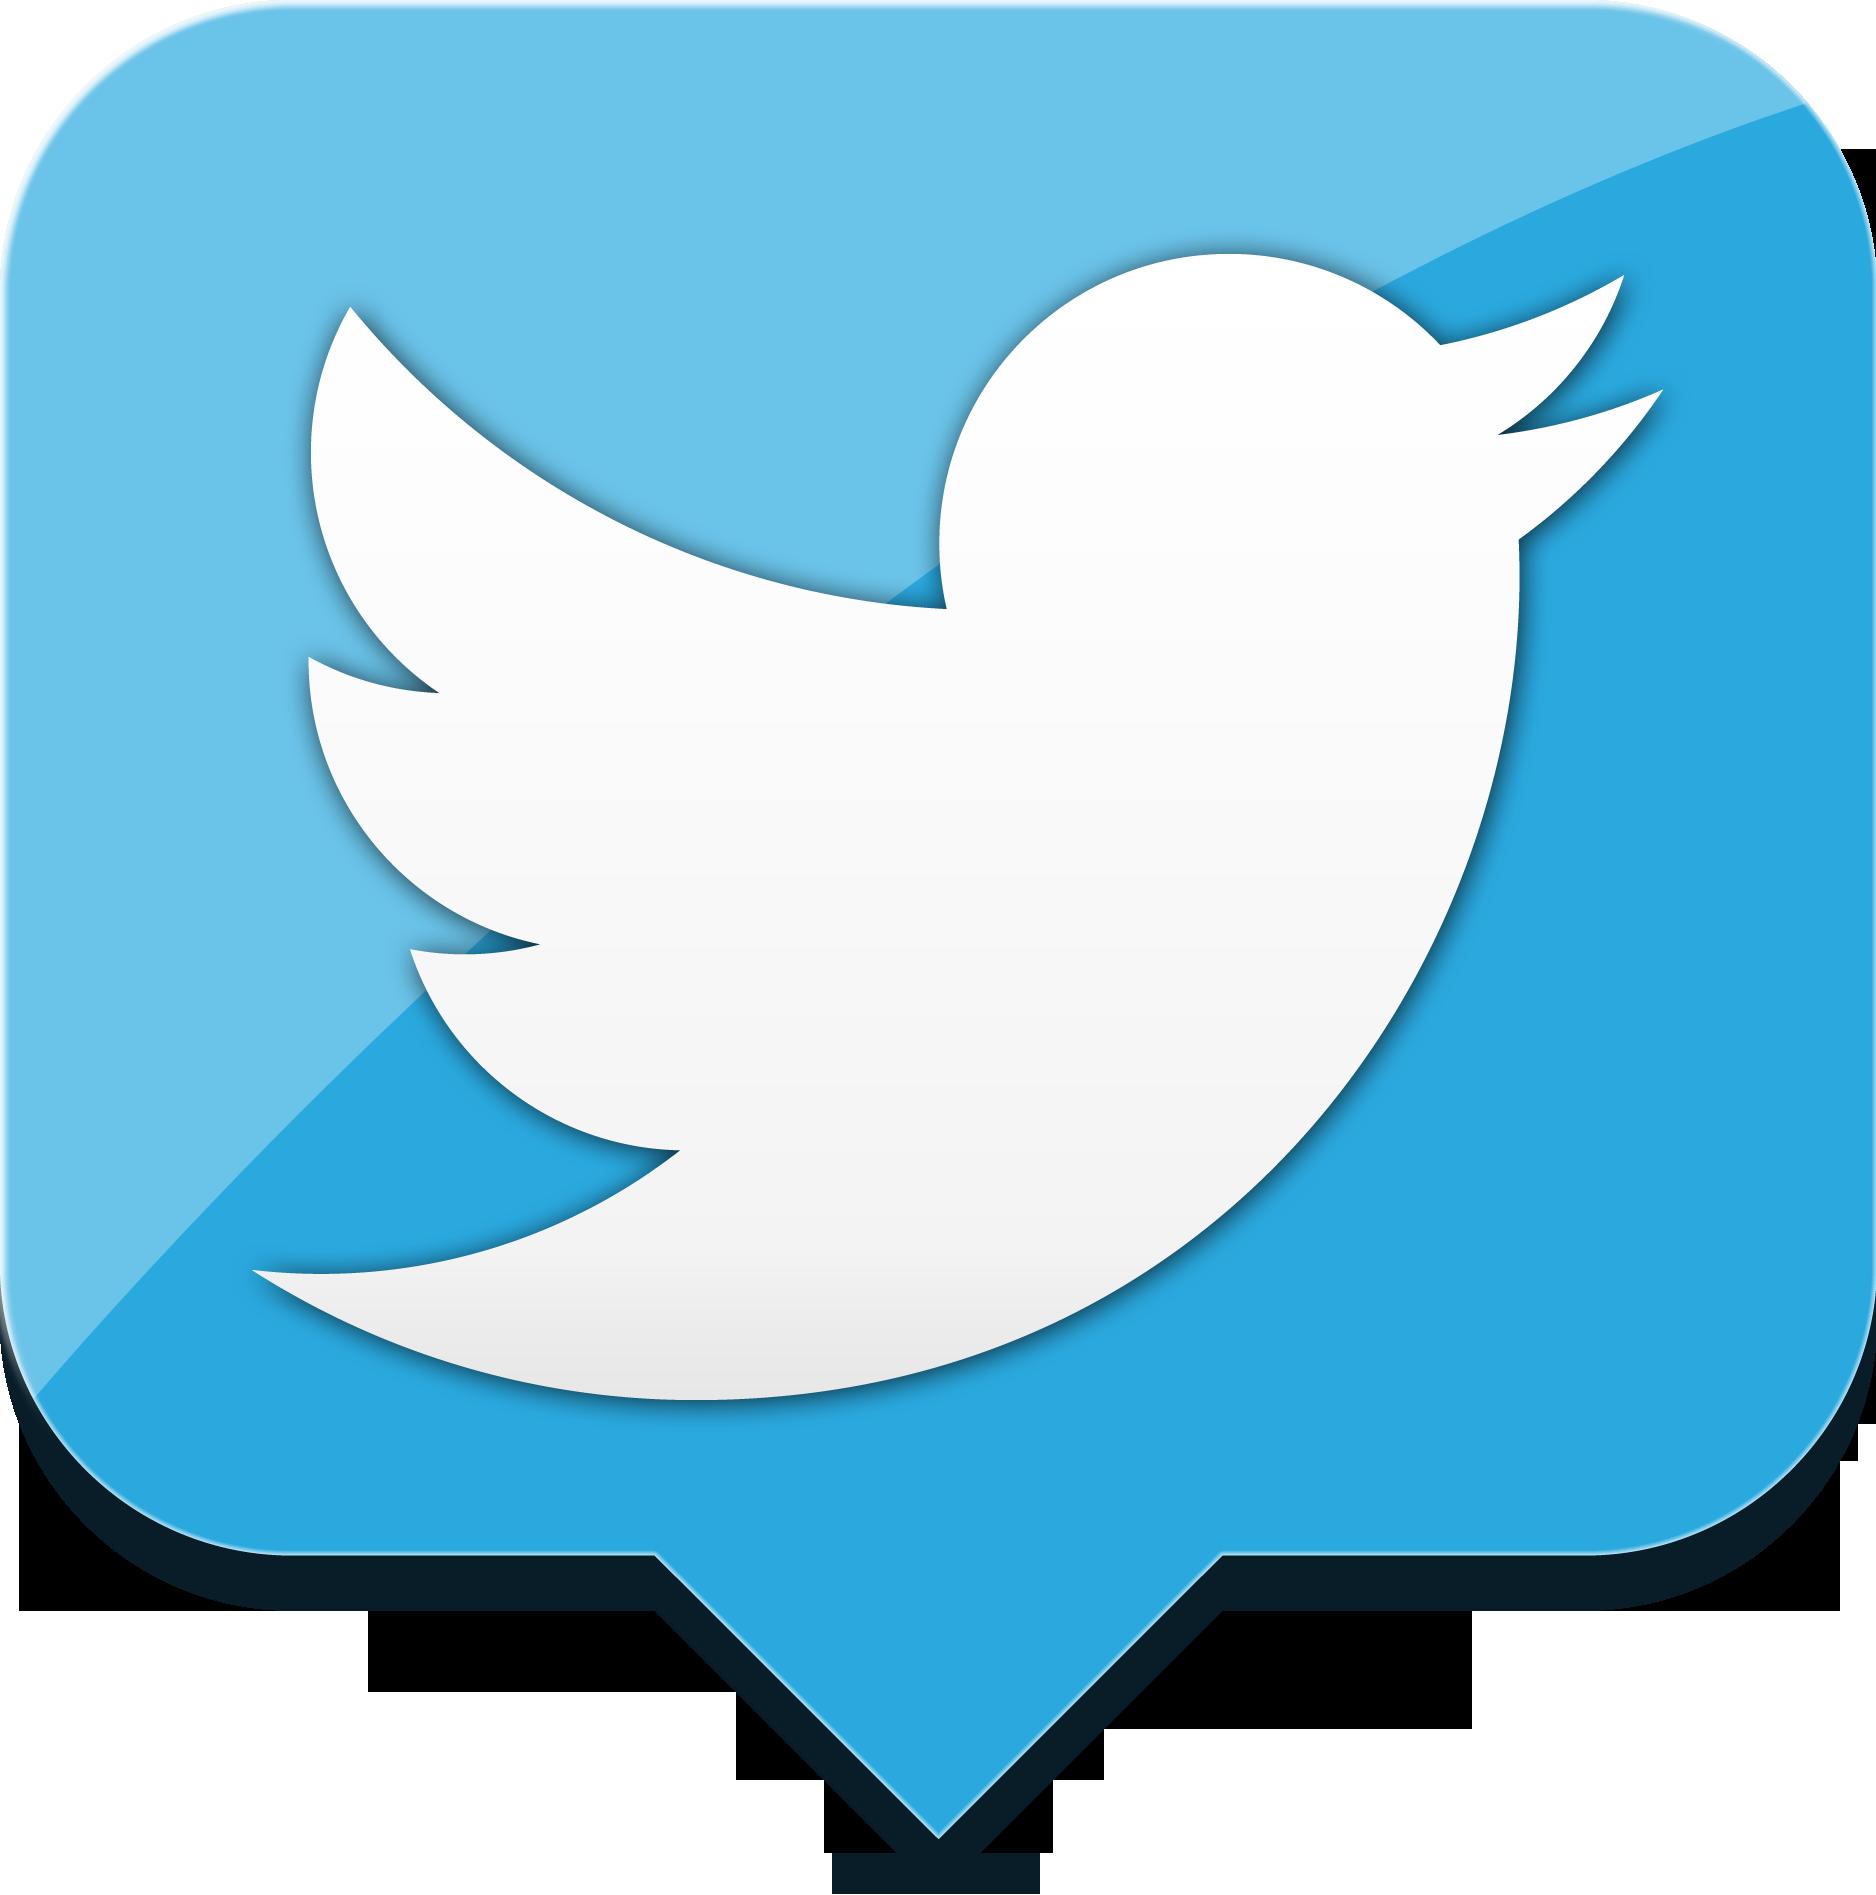 Twitter PNG Transparent Images.